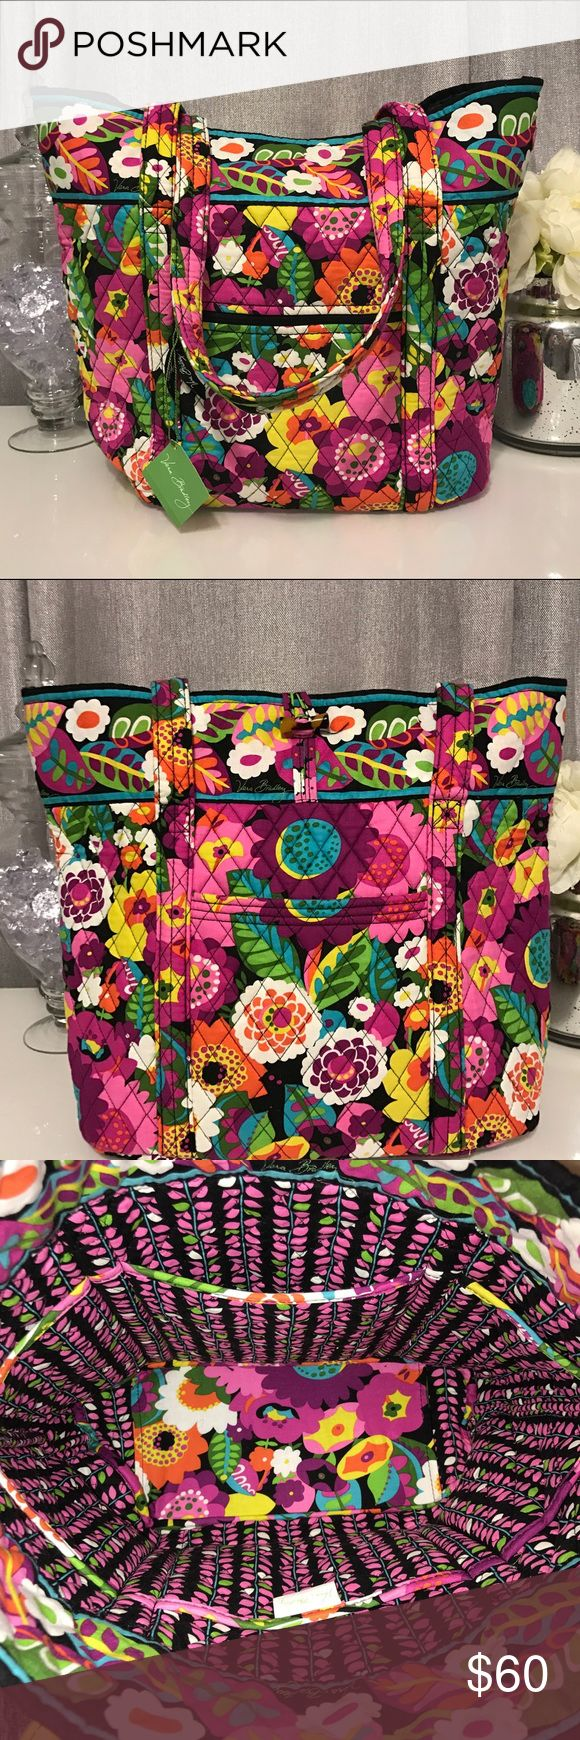 Vera bradley shower curtain - Nwt Vera Bradley Tote Bag Va Va Bloom Nwt